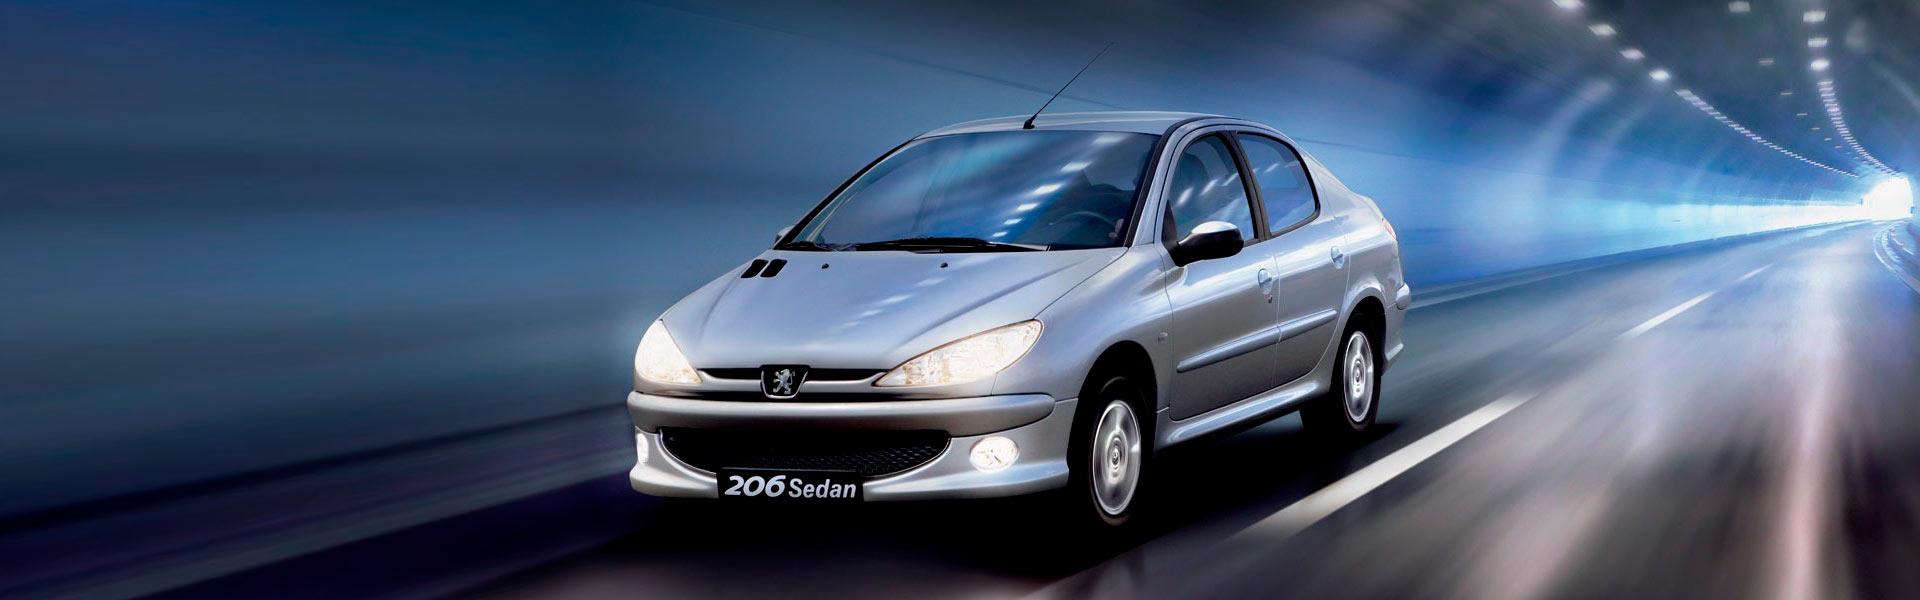 Сервис Peugeot 206